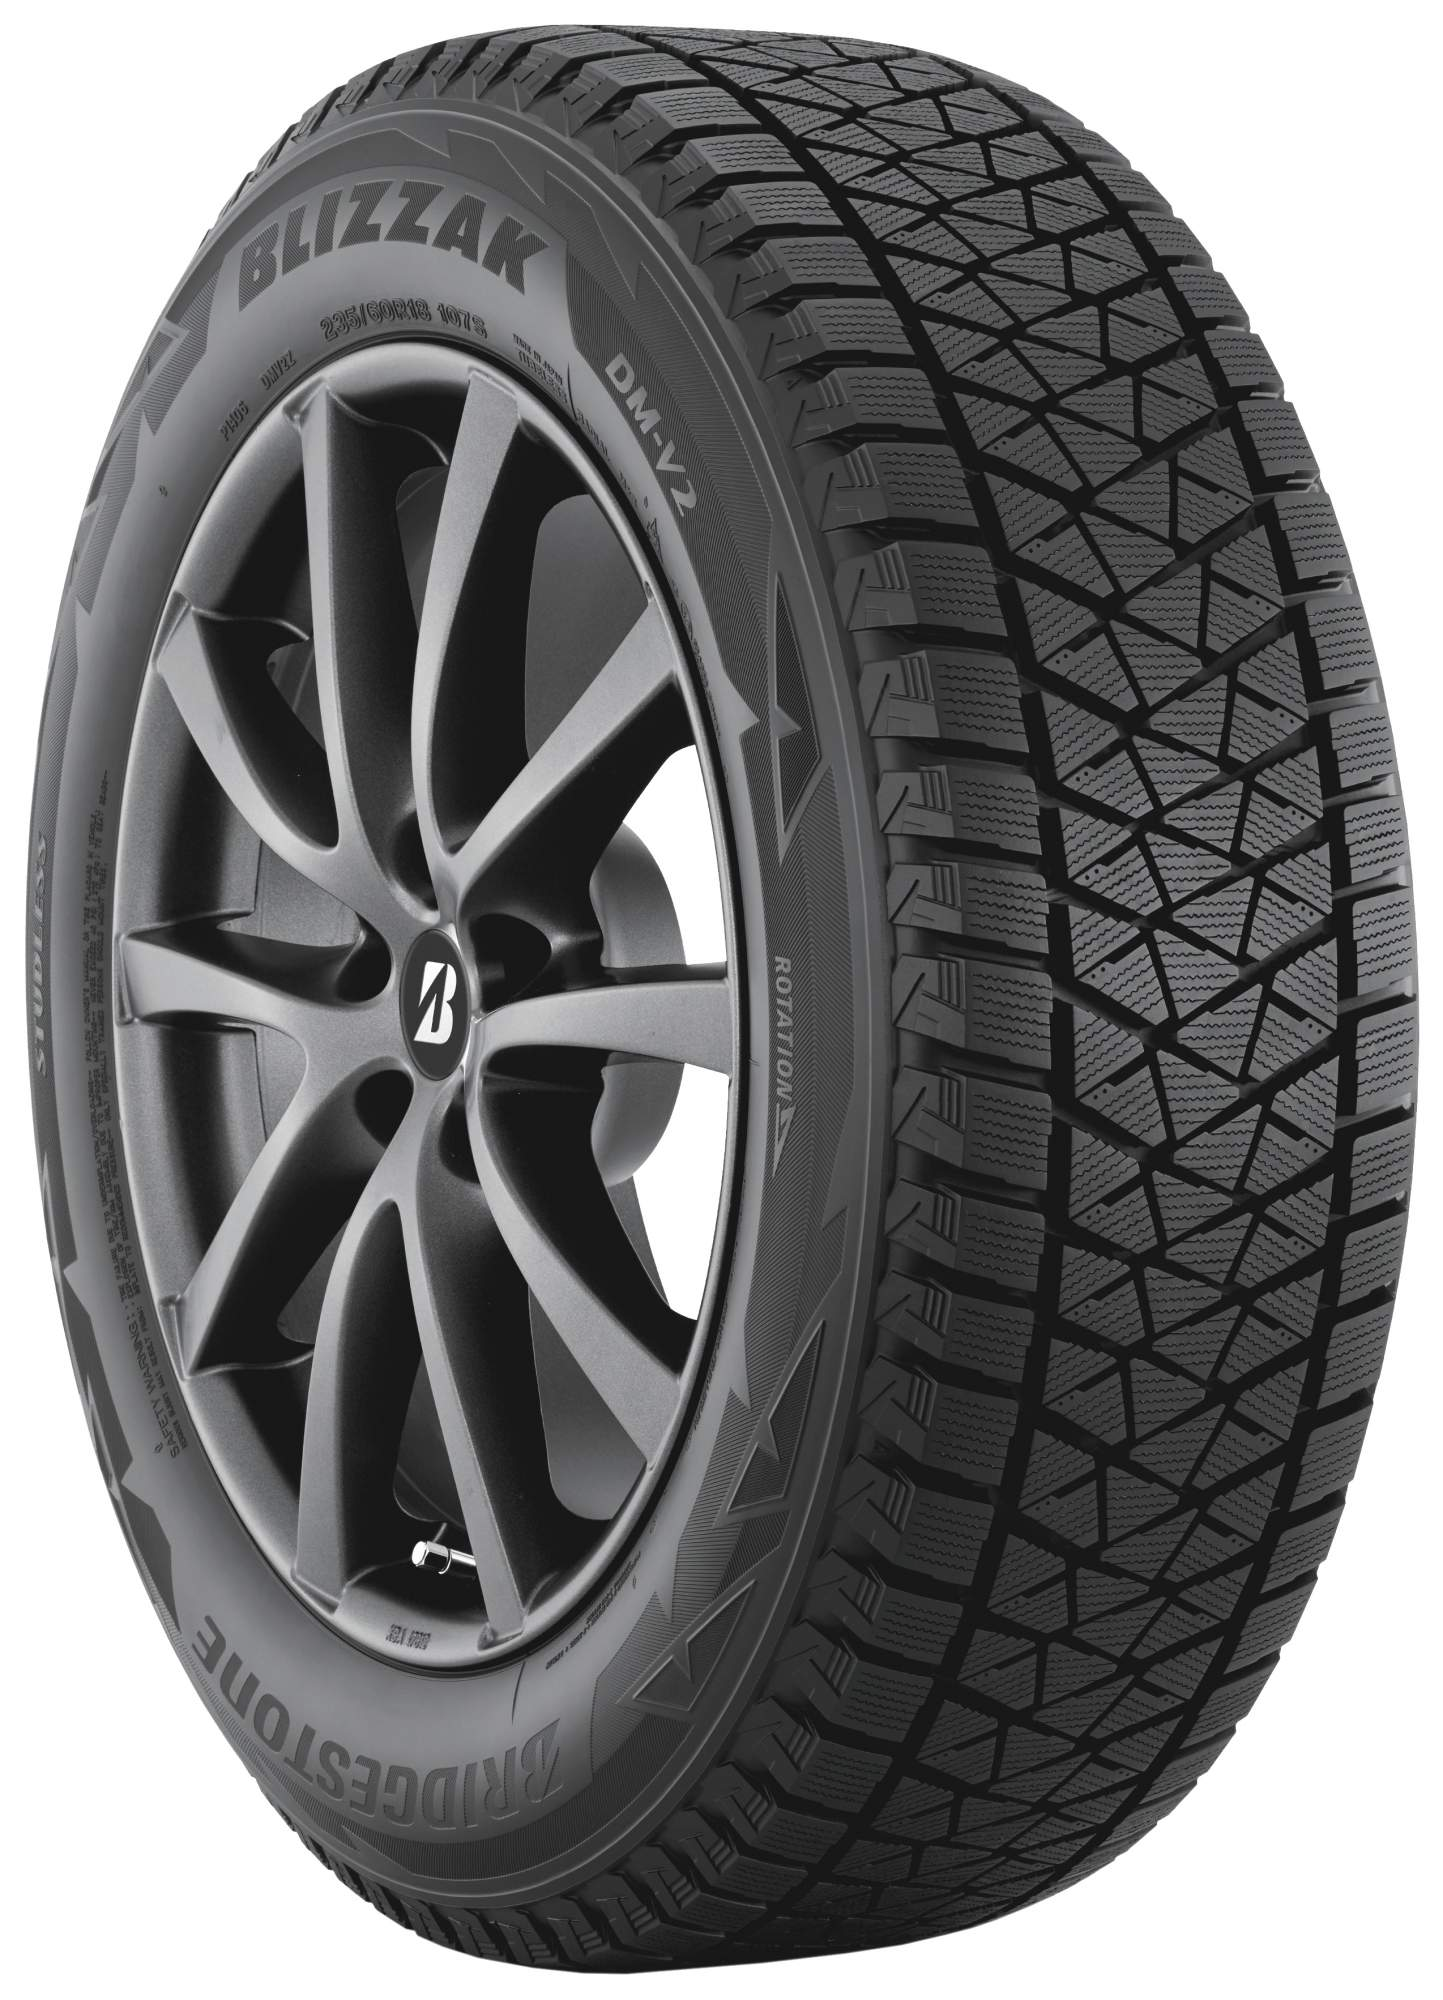 Автошина R17 265/65 Bridgestone Blizzak DM-V2 112R (зима)